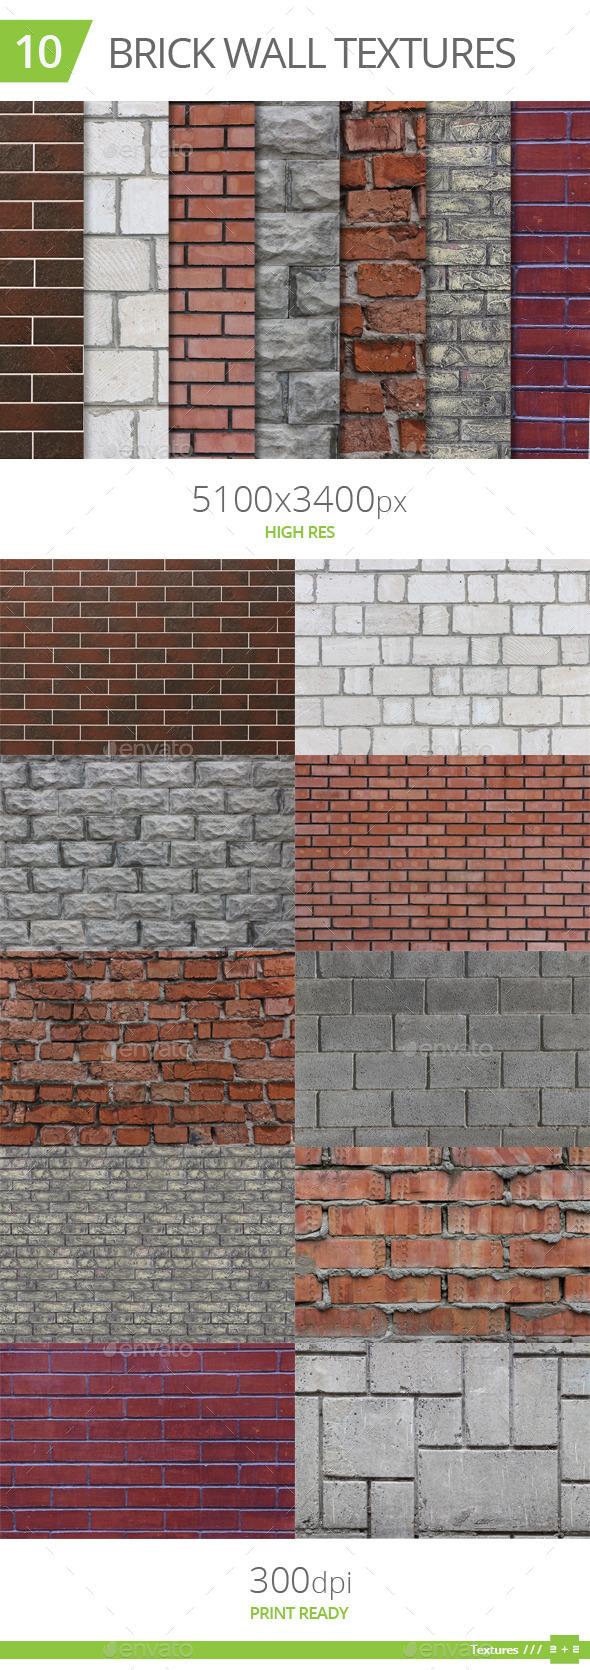 10 Brick Wall Textures - Stone Textures